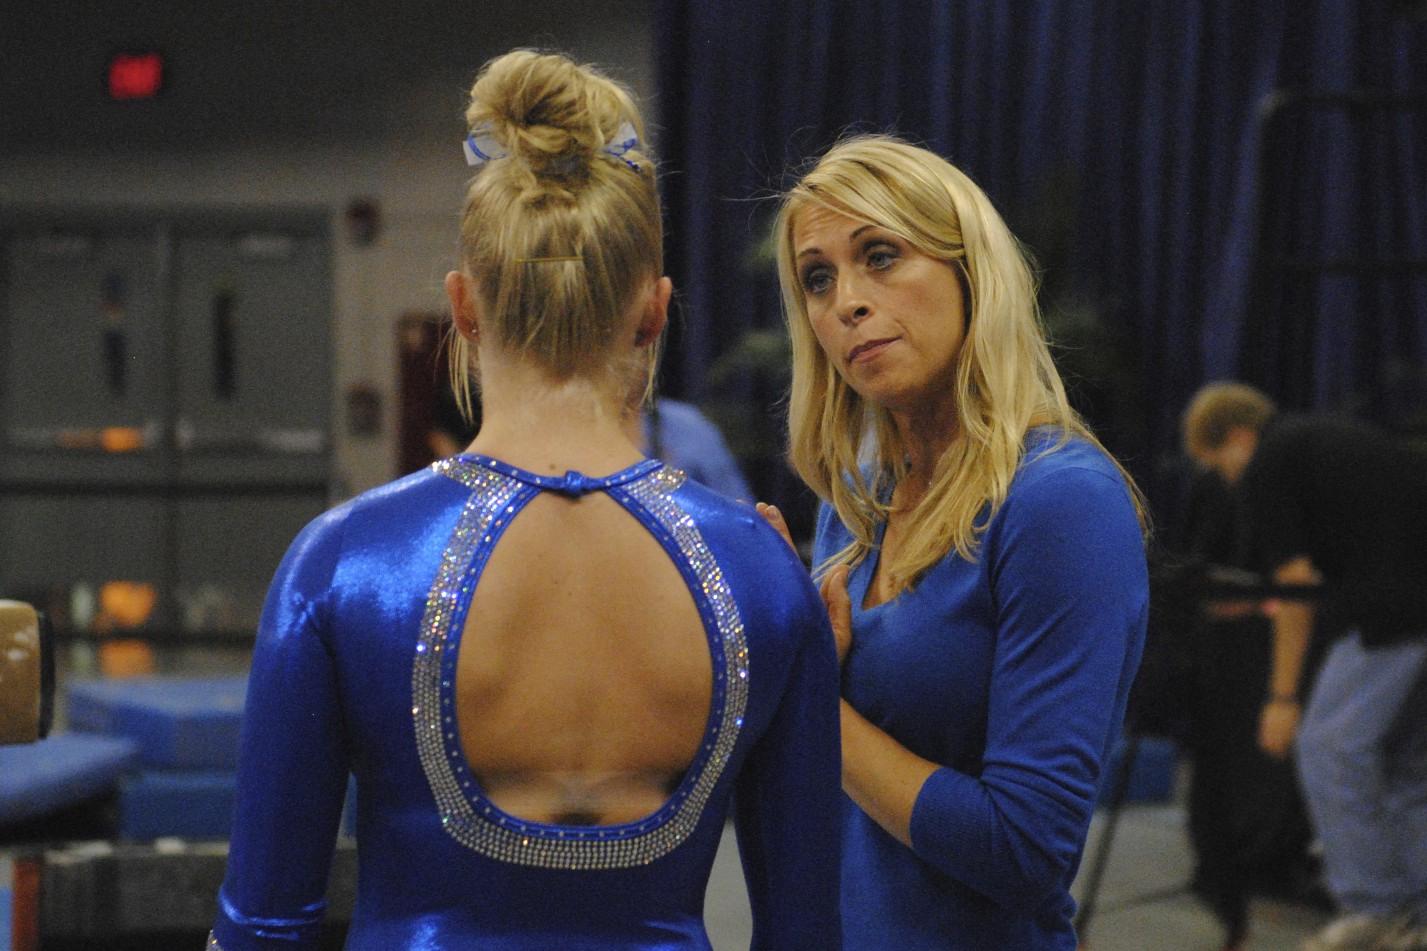 Head Coach Rhonda Faehn prepares freshman Rachel Spicer for her beam routine.